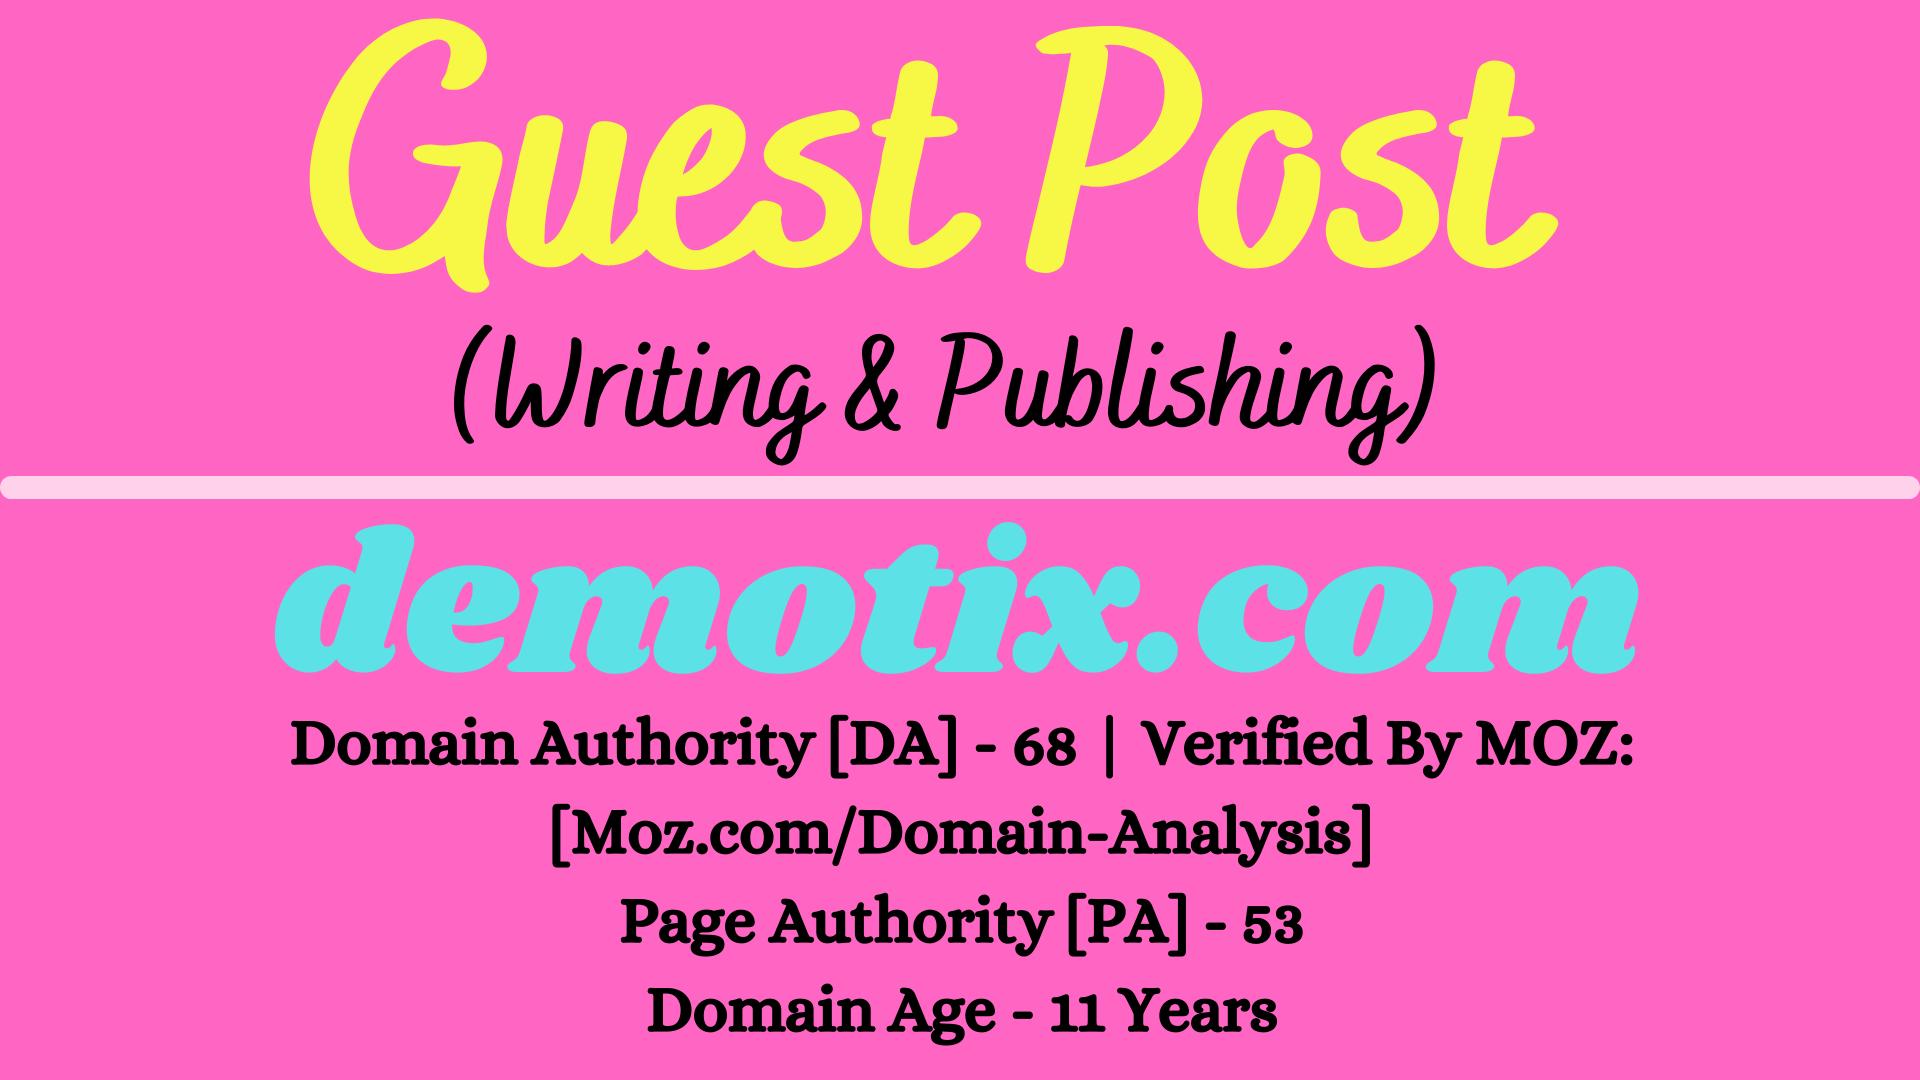 I will provide Guest Post on demotix. com